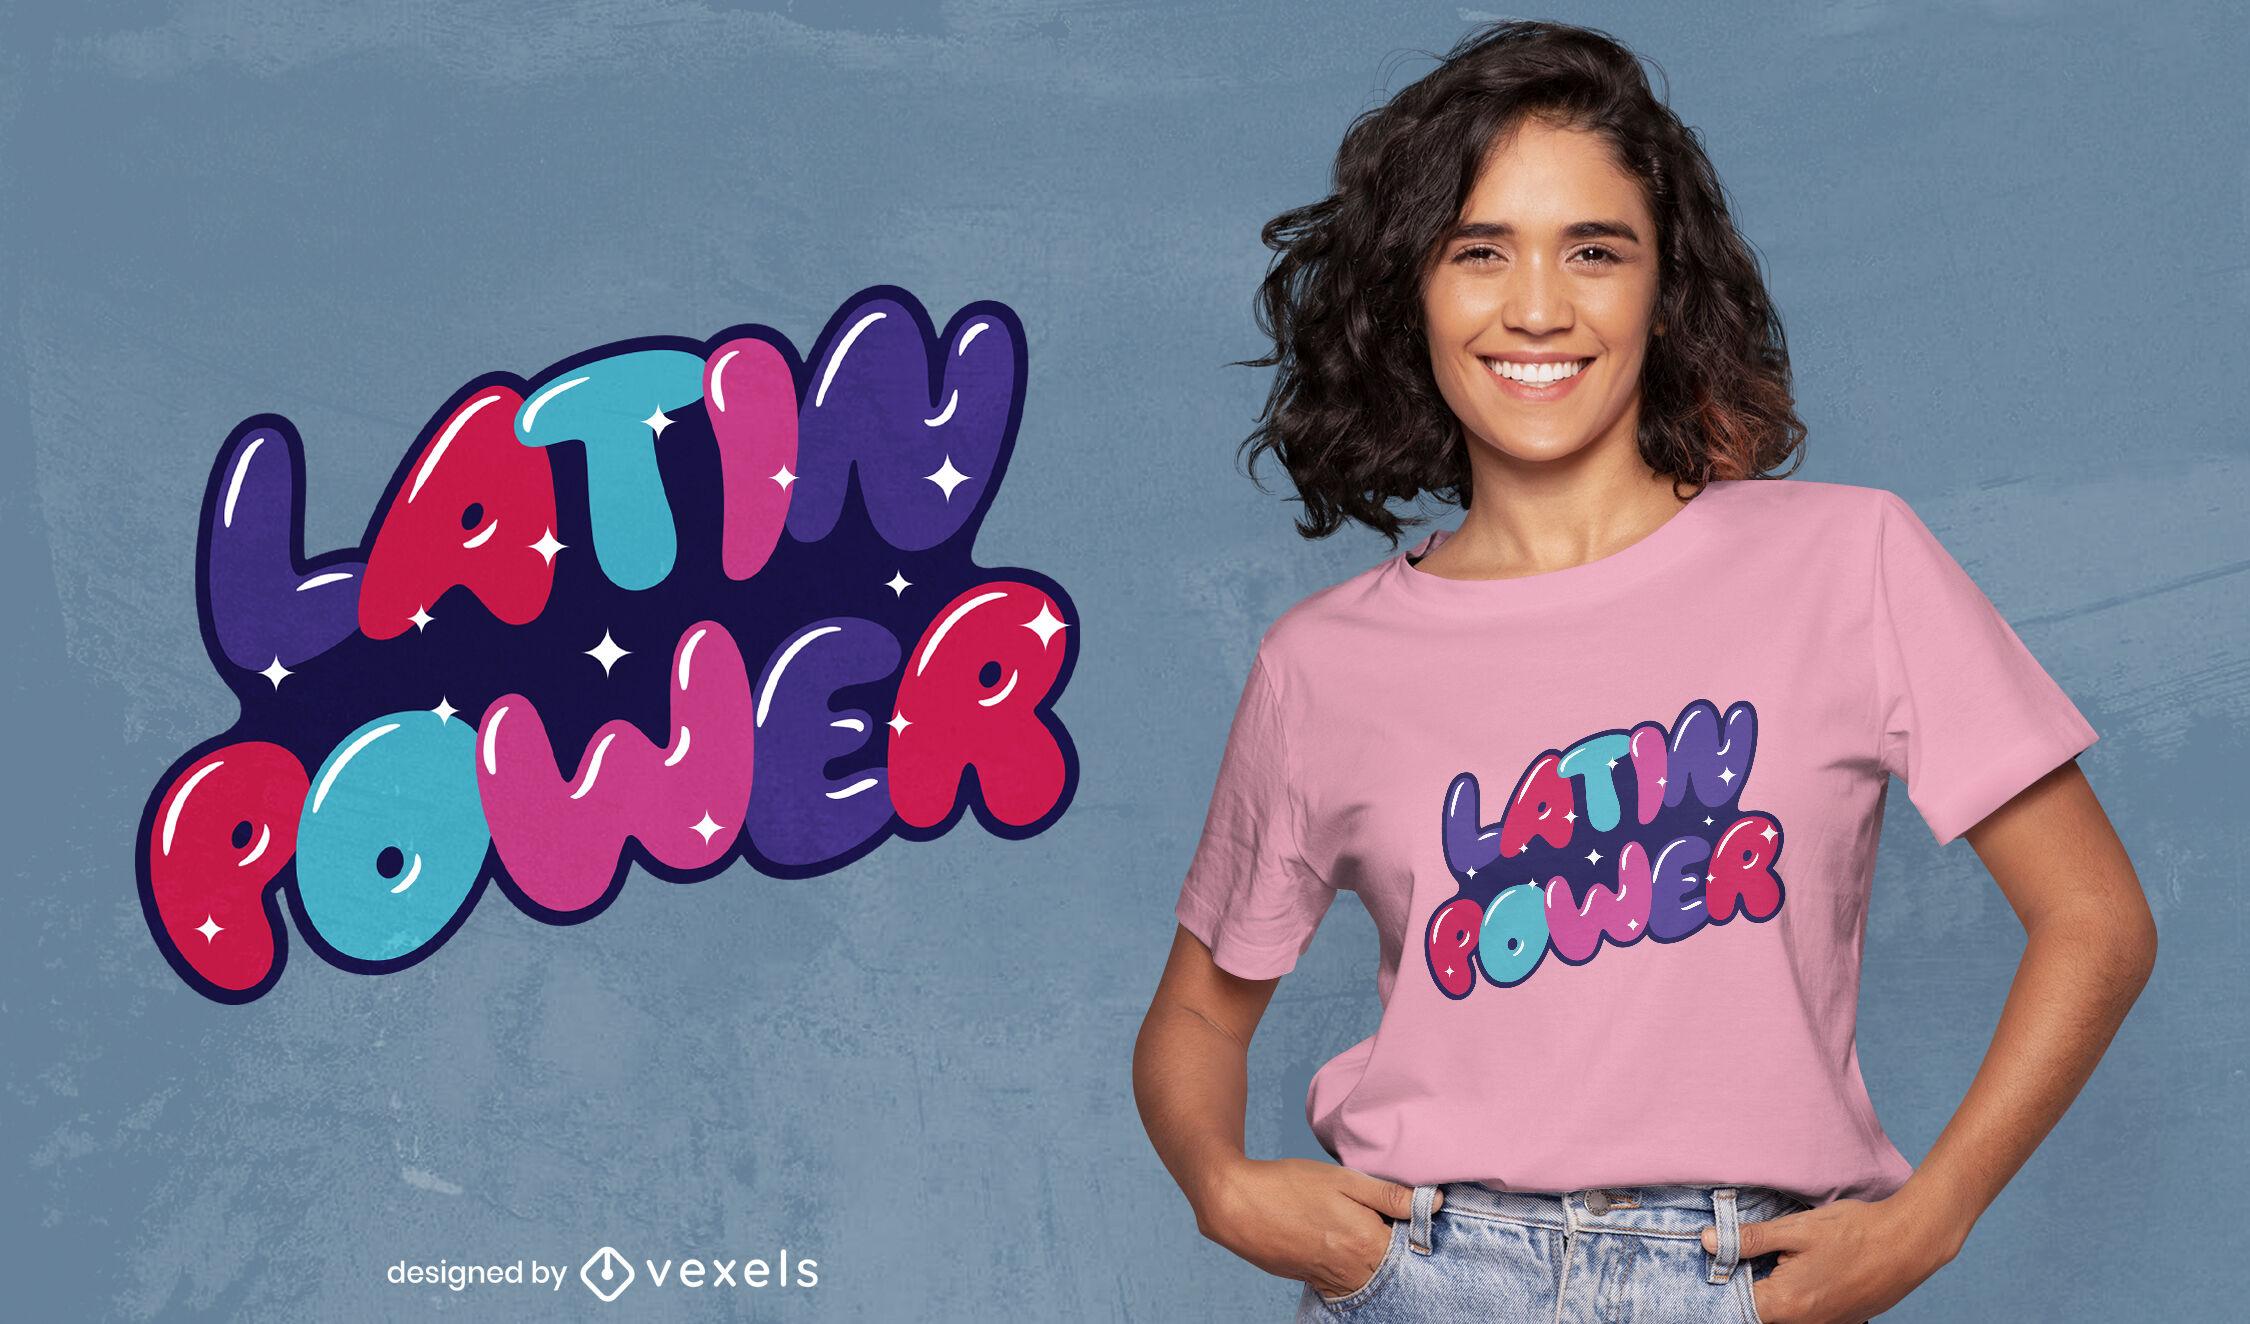 Latin power sparkly t-shirt design